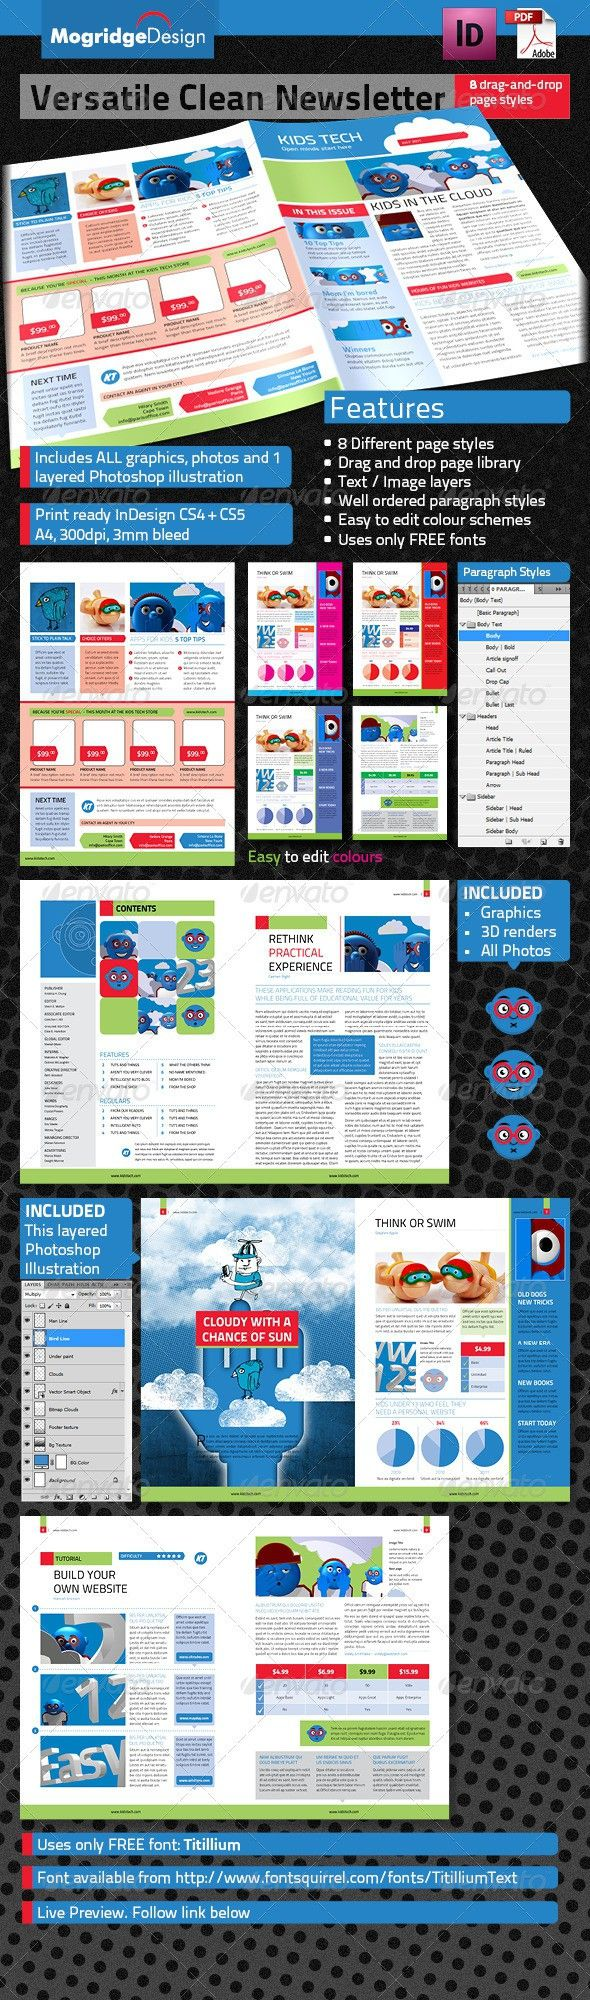 versatile tech newsletter e newsletter templates pinterest